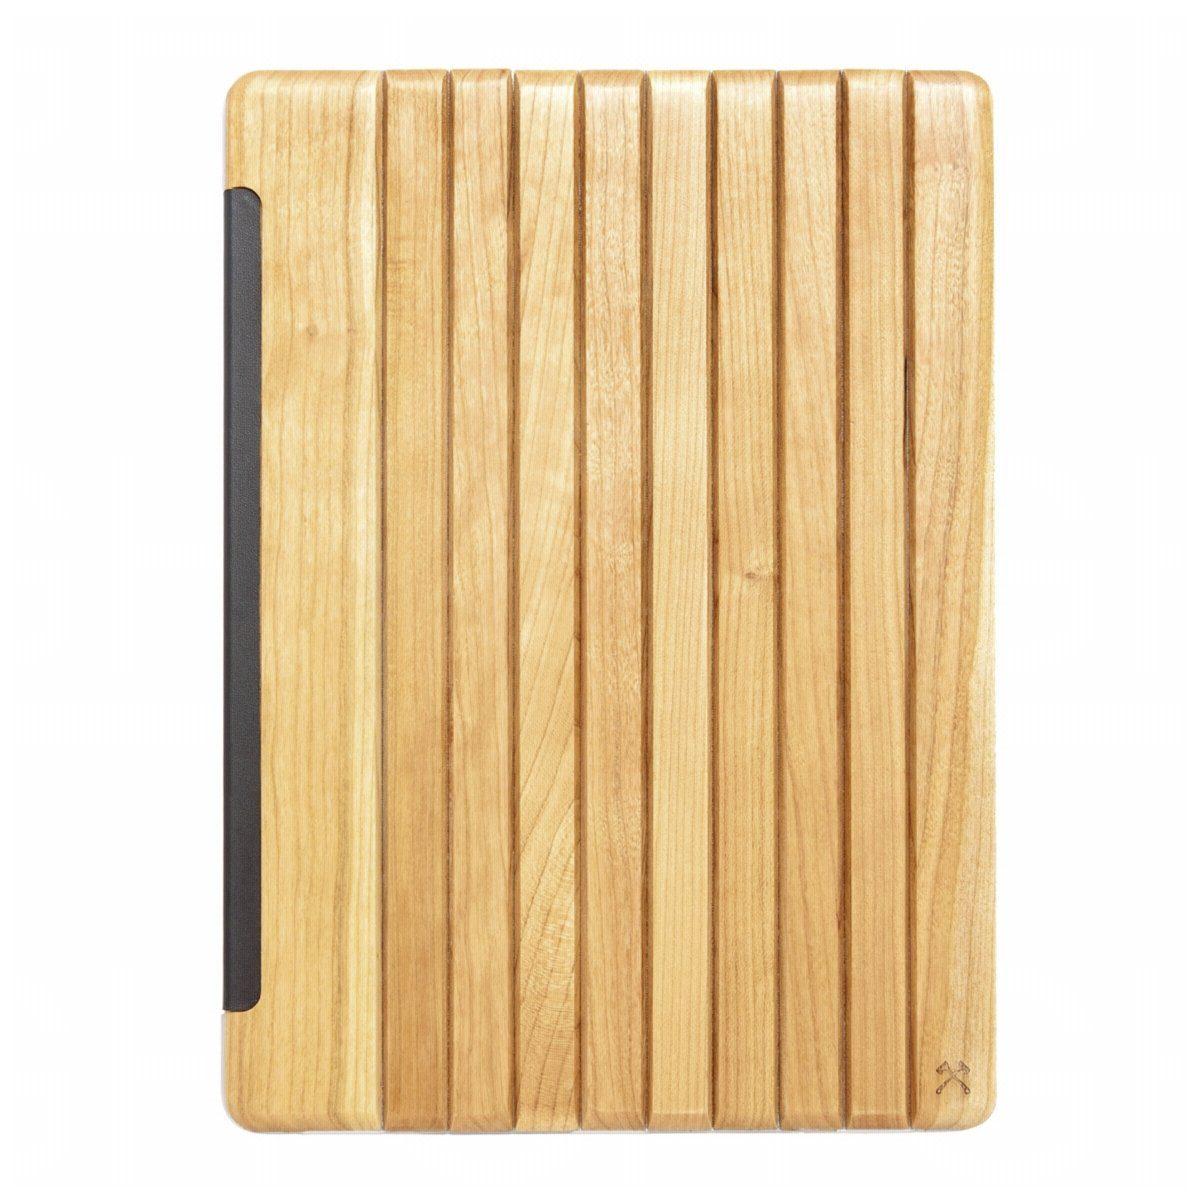 "Woodcessories EcoGuard - Echtholz Case für iPad Pro 12,9""- Tackleberry"